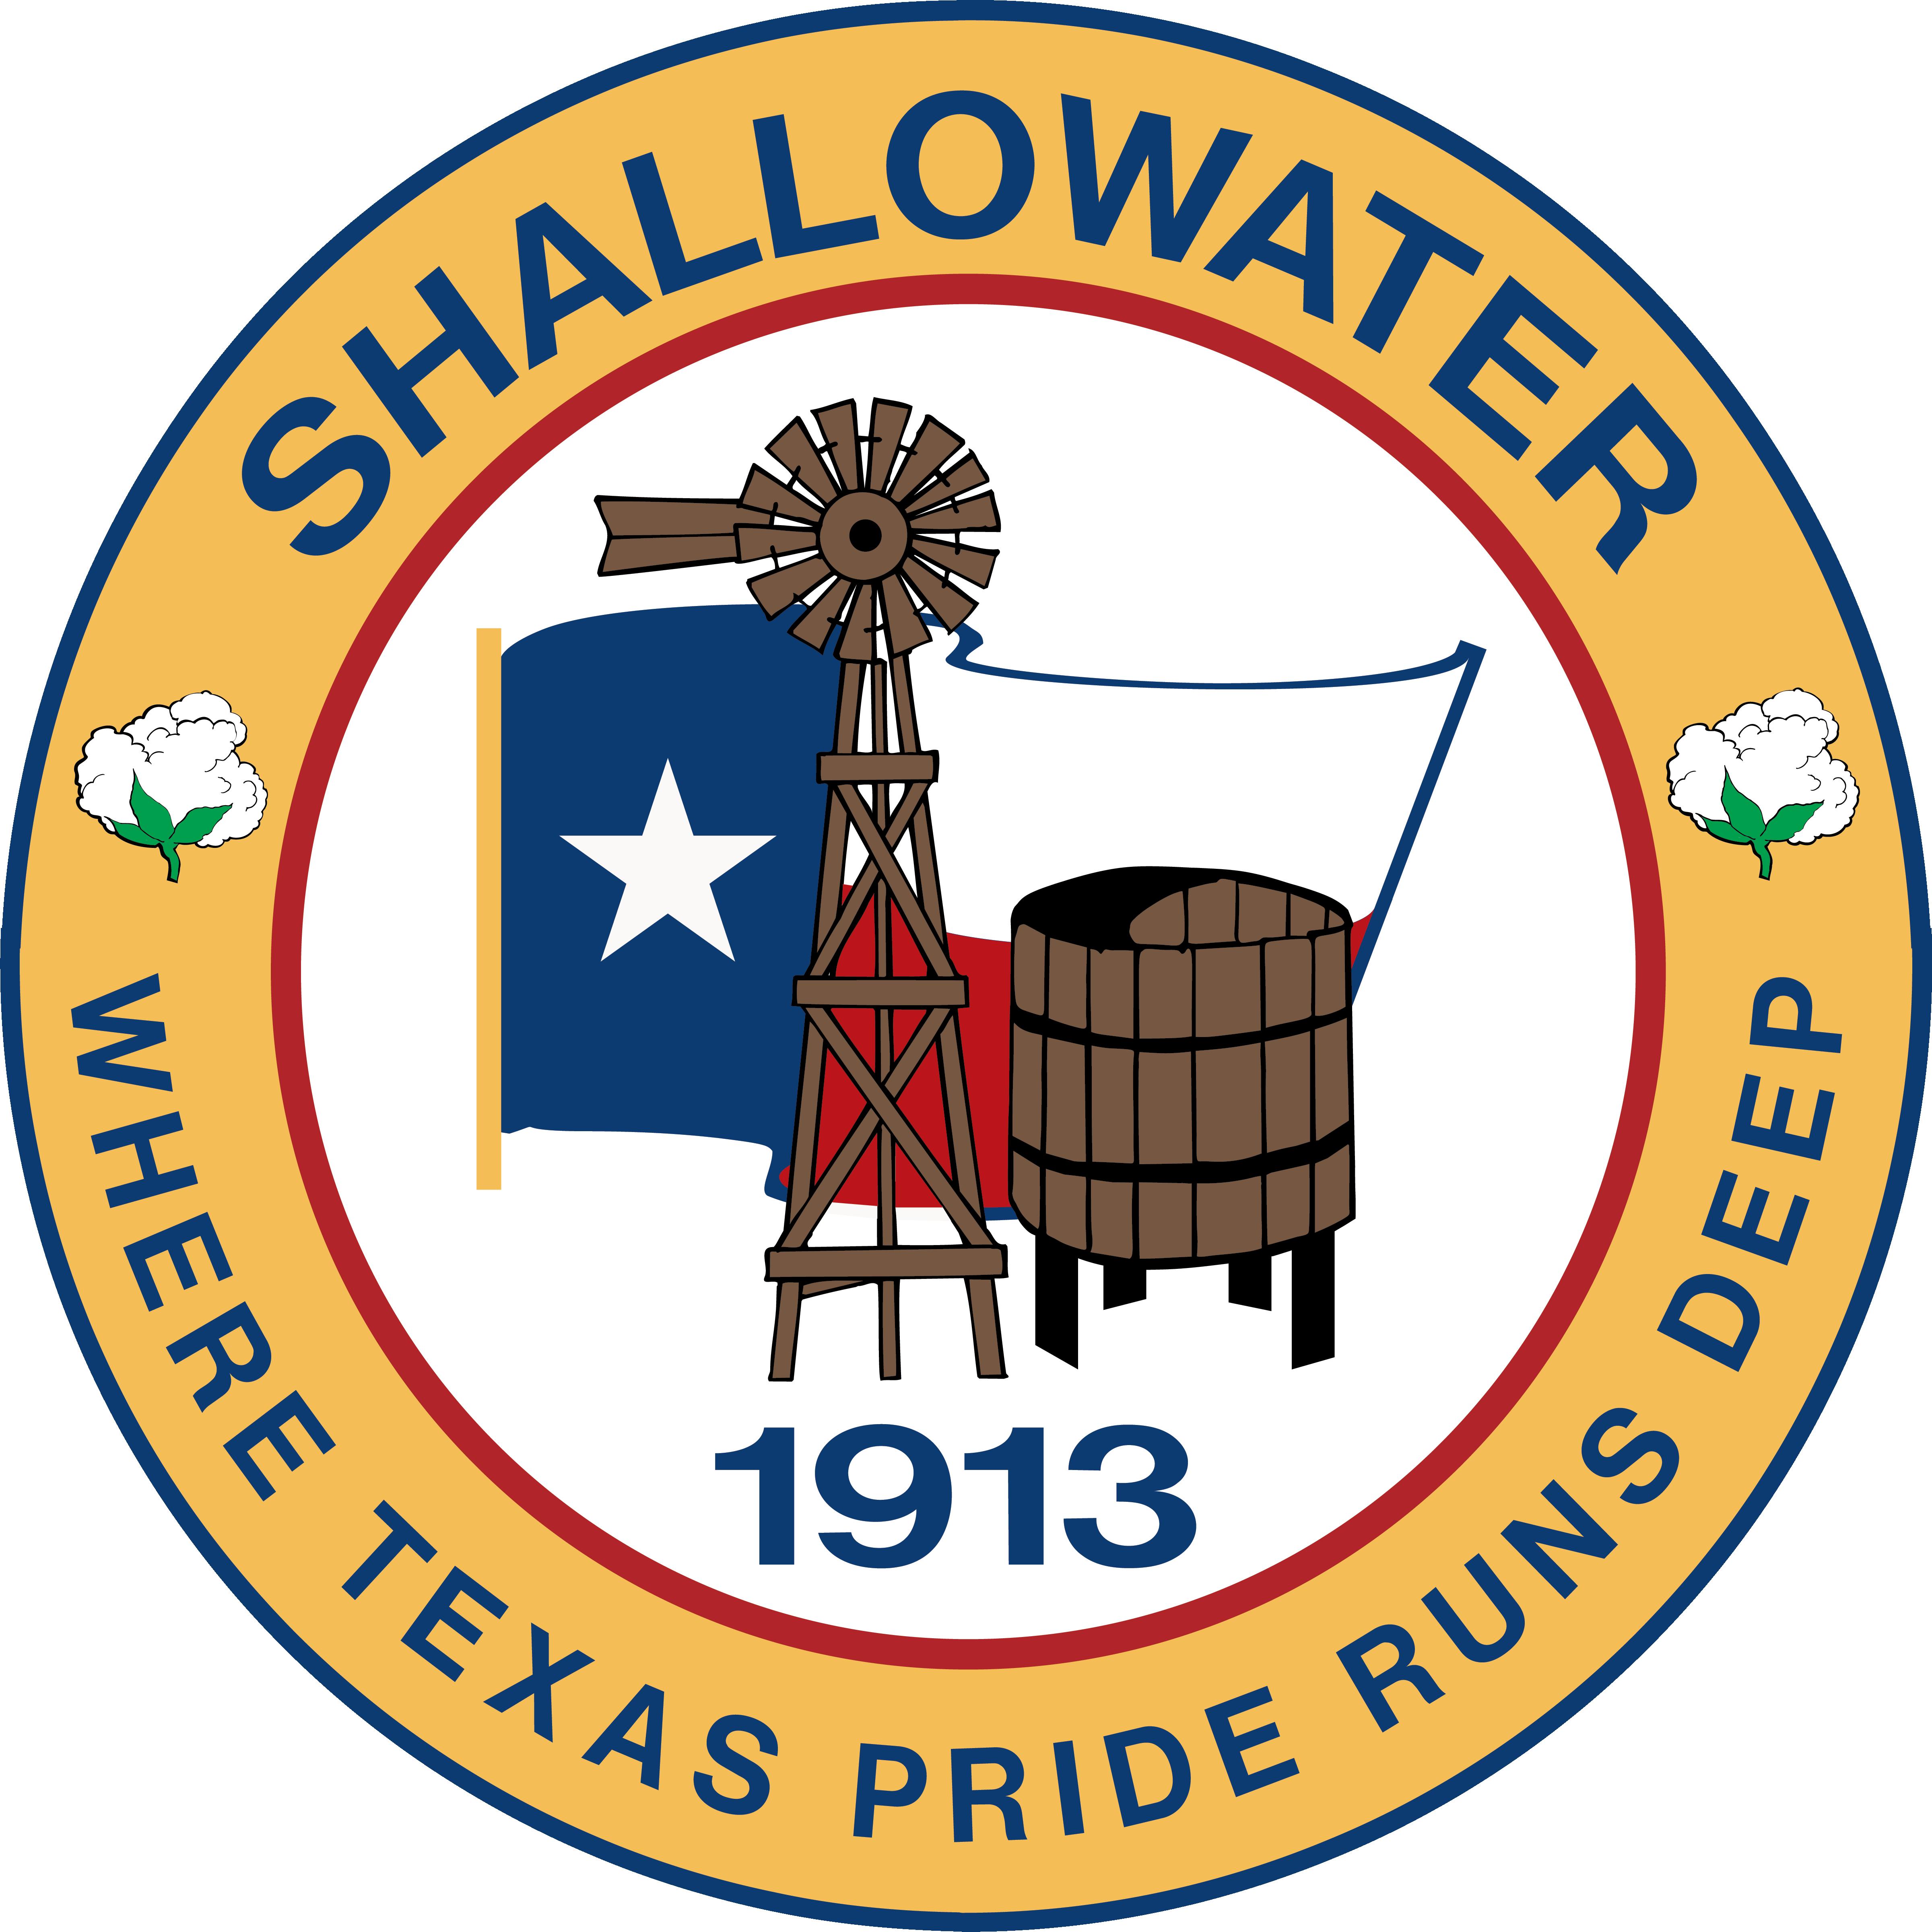 Shallowater Texas